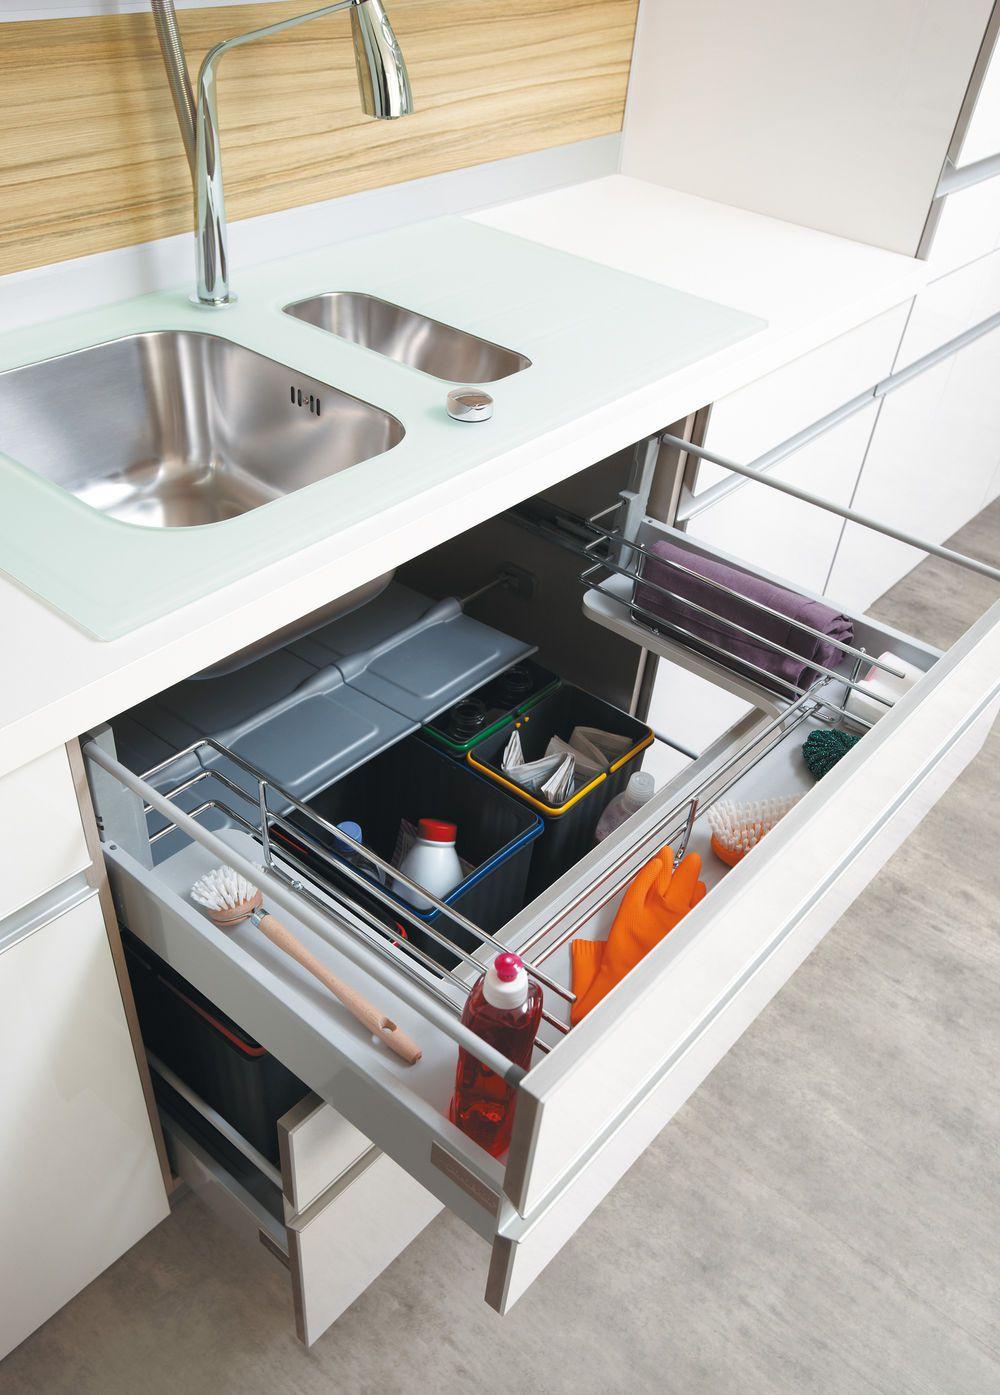 Intérieur Idée Pour Cuisine Ikea Meuble Tiroir Uspzvqm